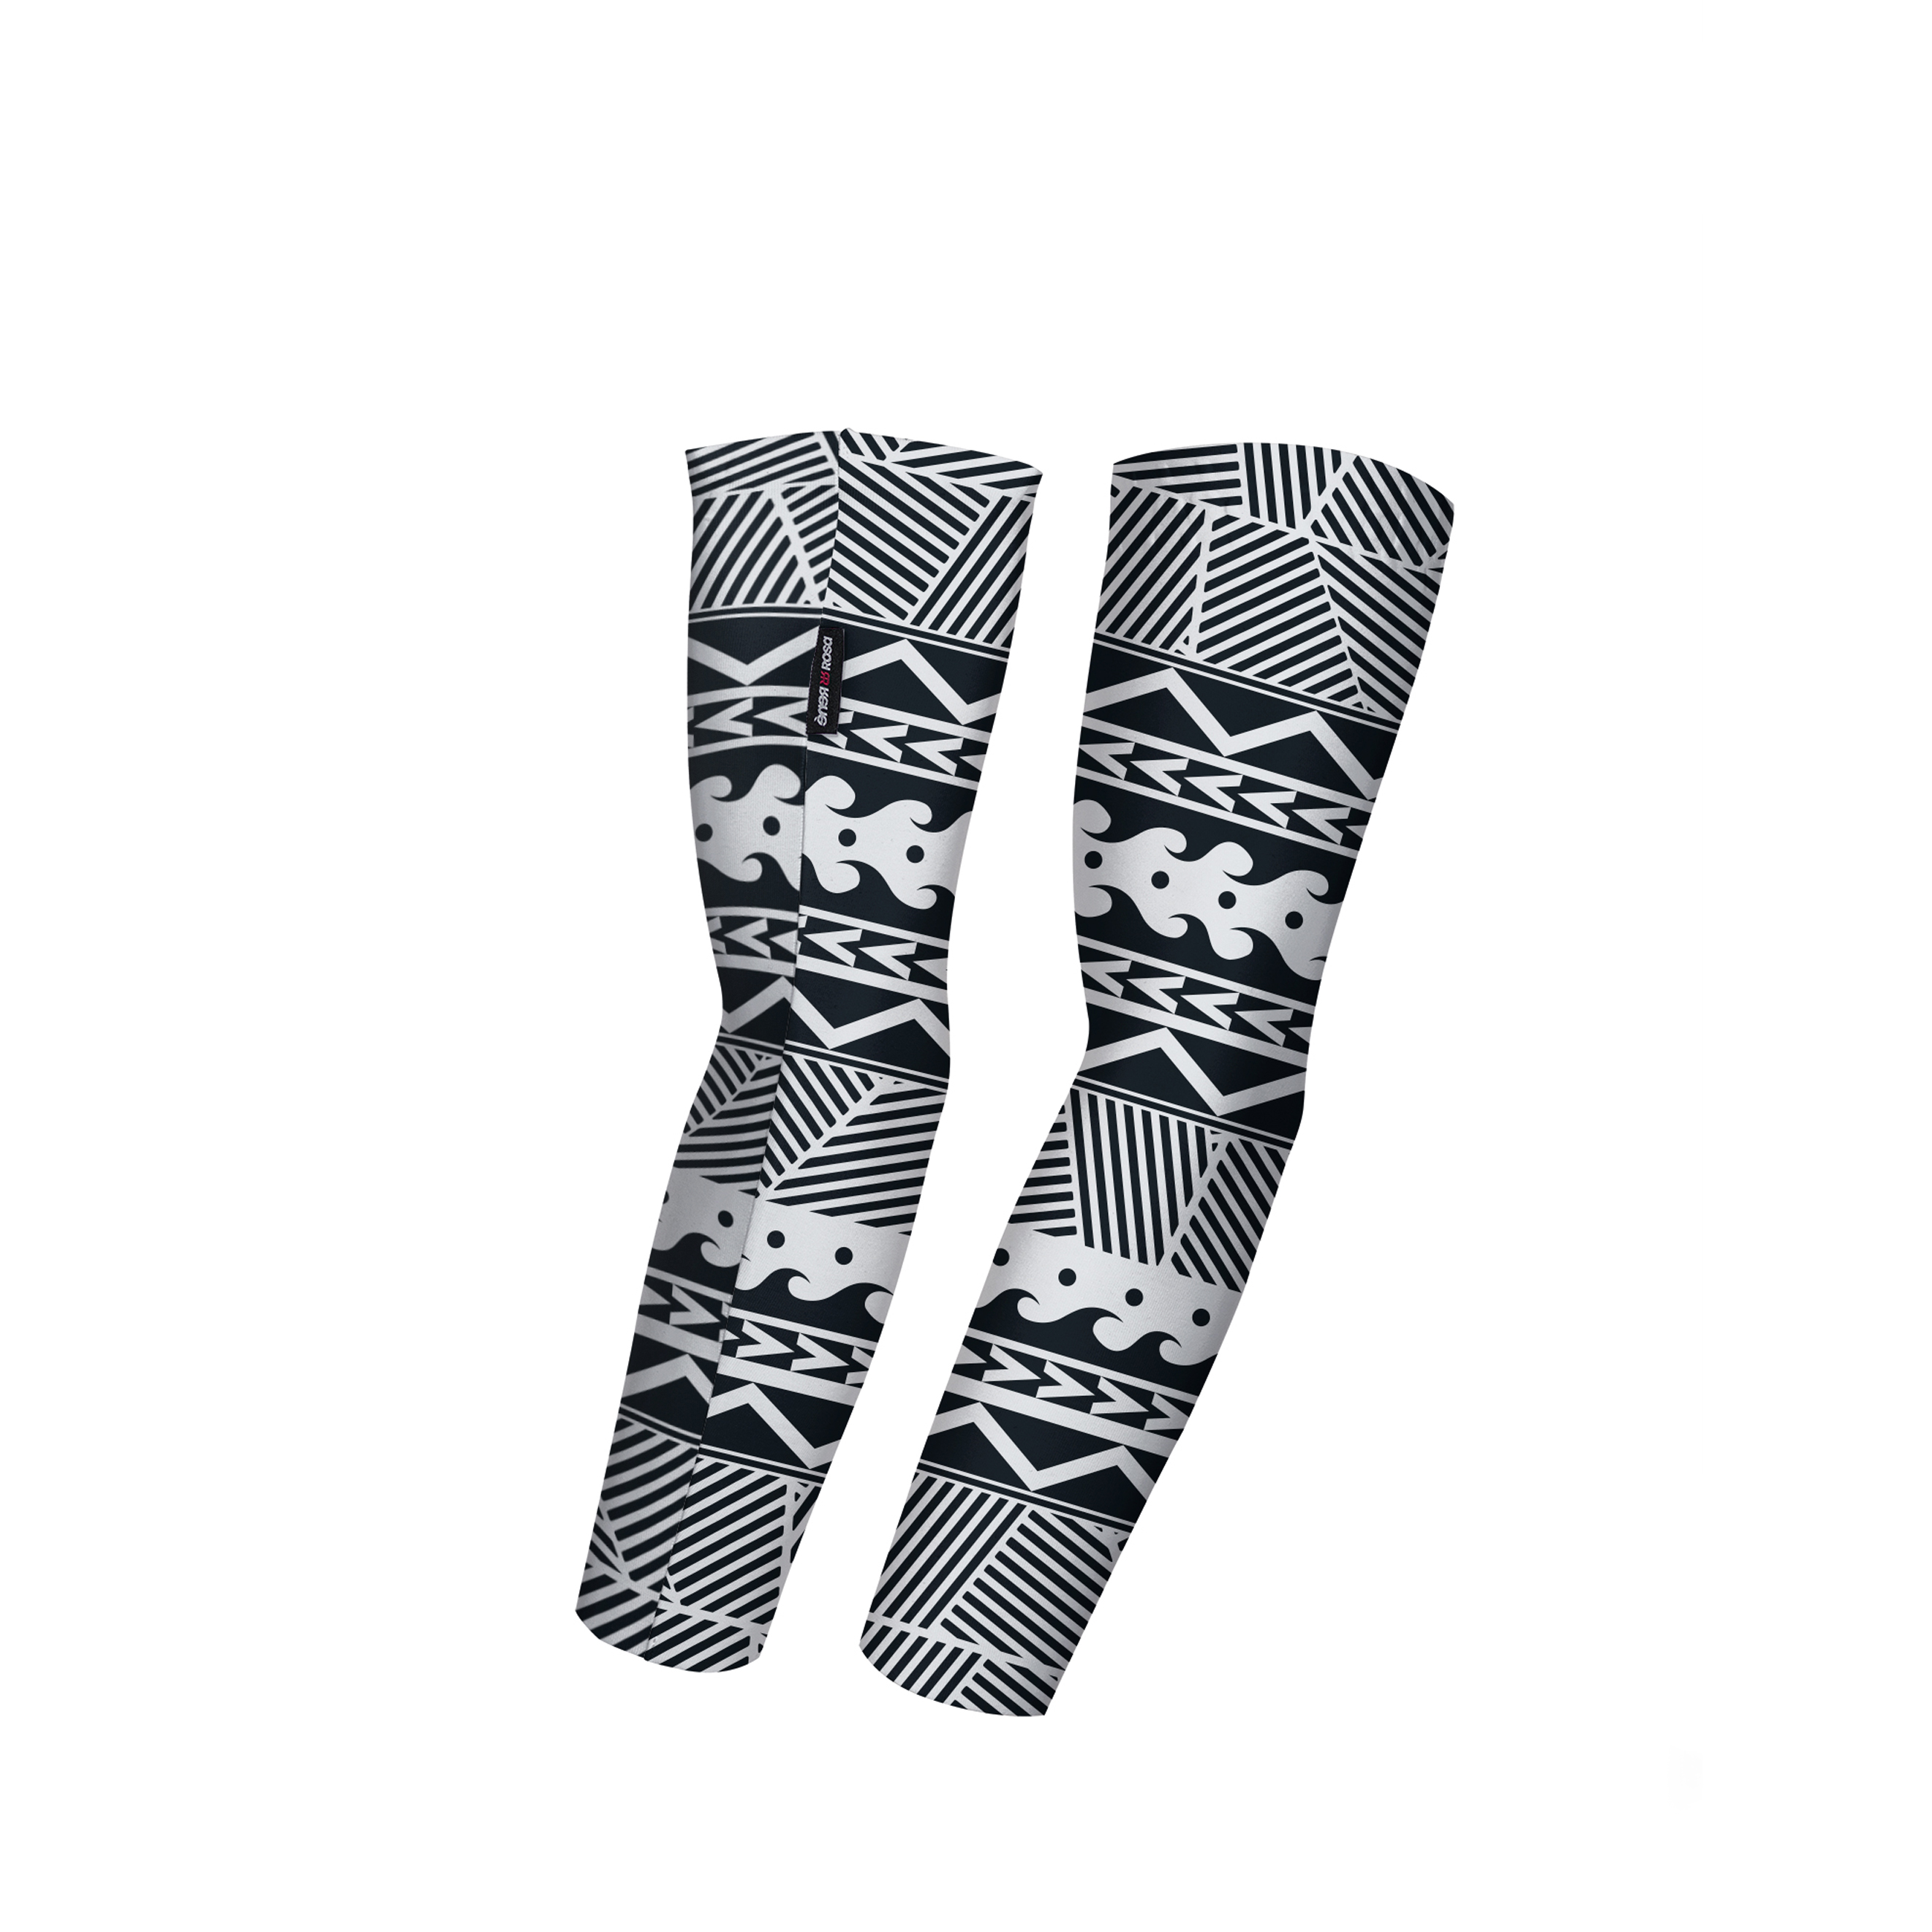 Armlinge RRT1940U  / Maorri - Unaunahi / Design of the Month